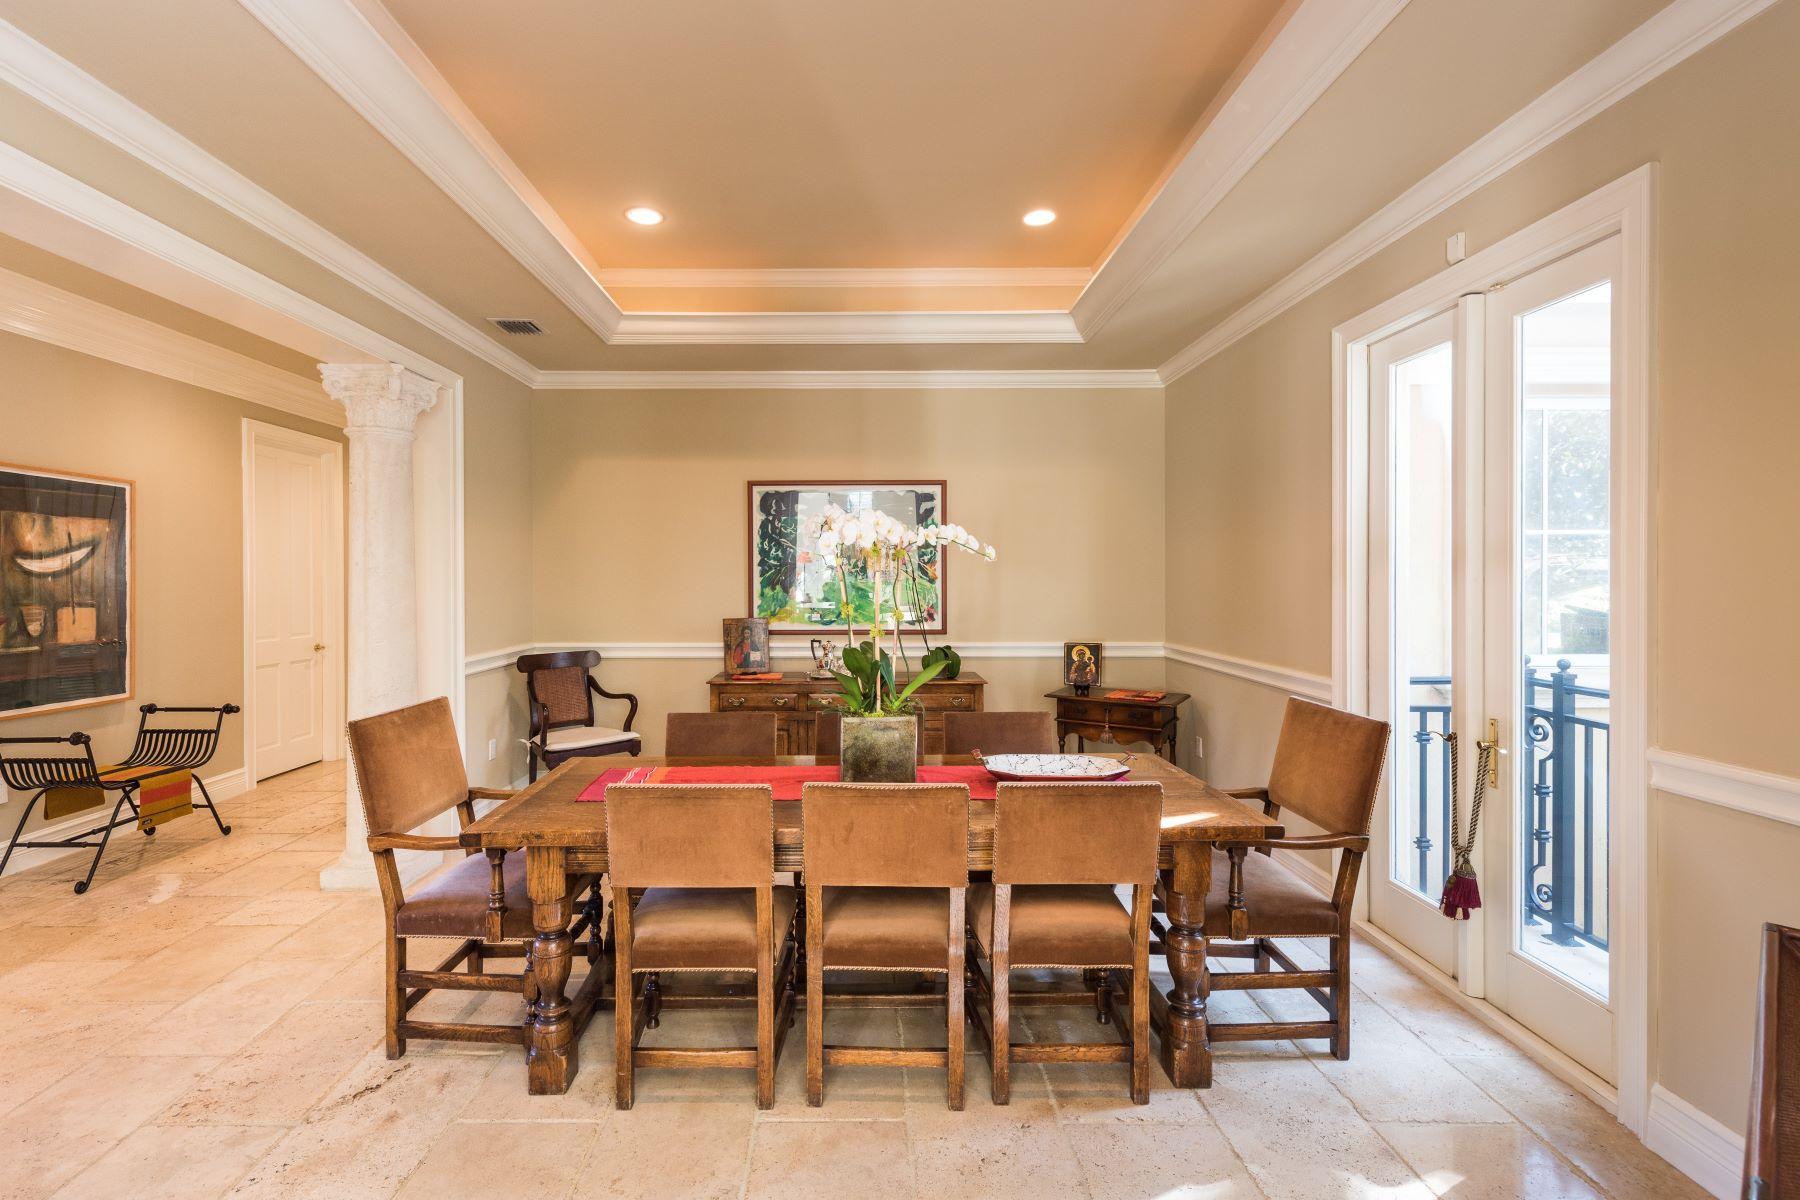 Additional photo for property listing at 471 N Mashta Dr 471 N Mashta Dr Key Biscayne, Florida 33149 United States